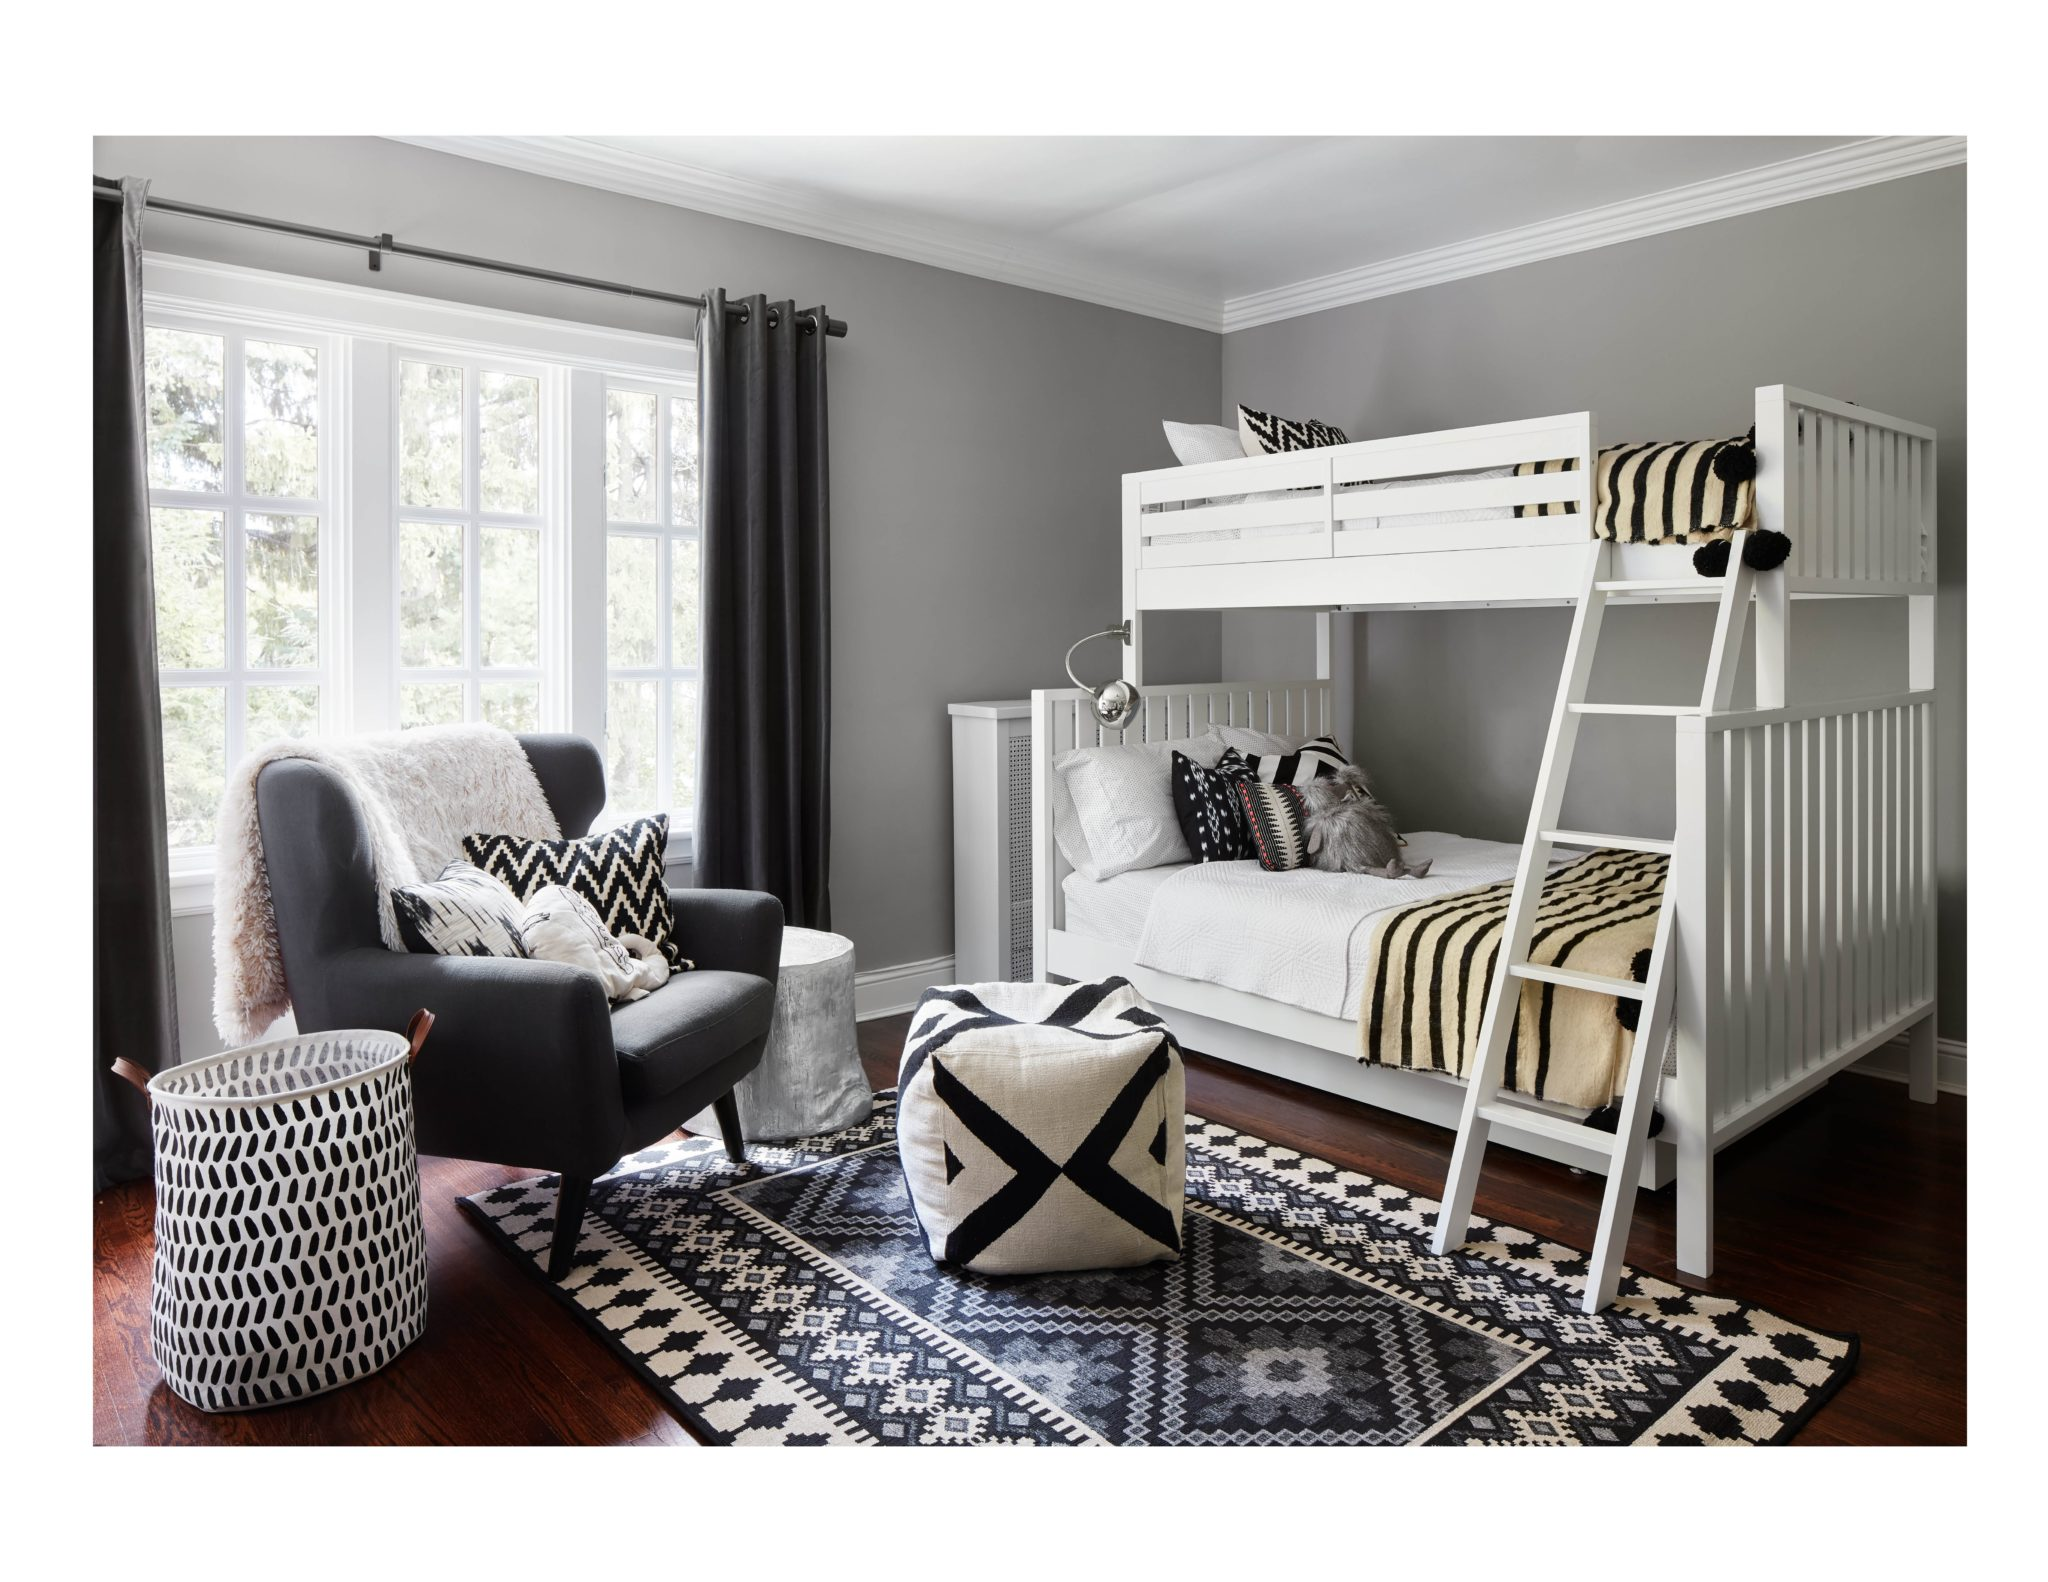 Wilmette Black and White Kids Bedroom by Jen Talbot Design